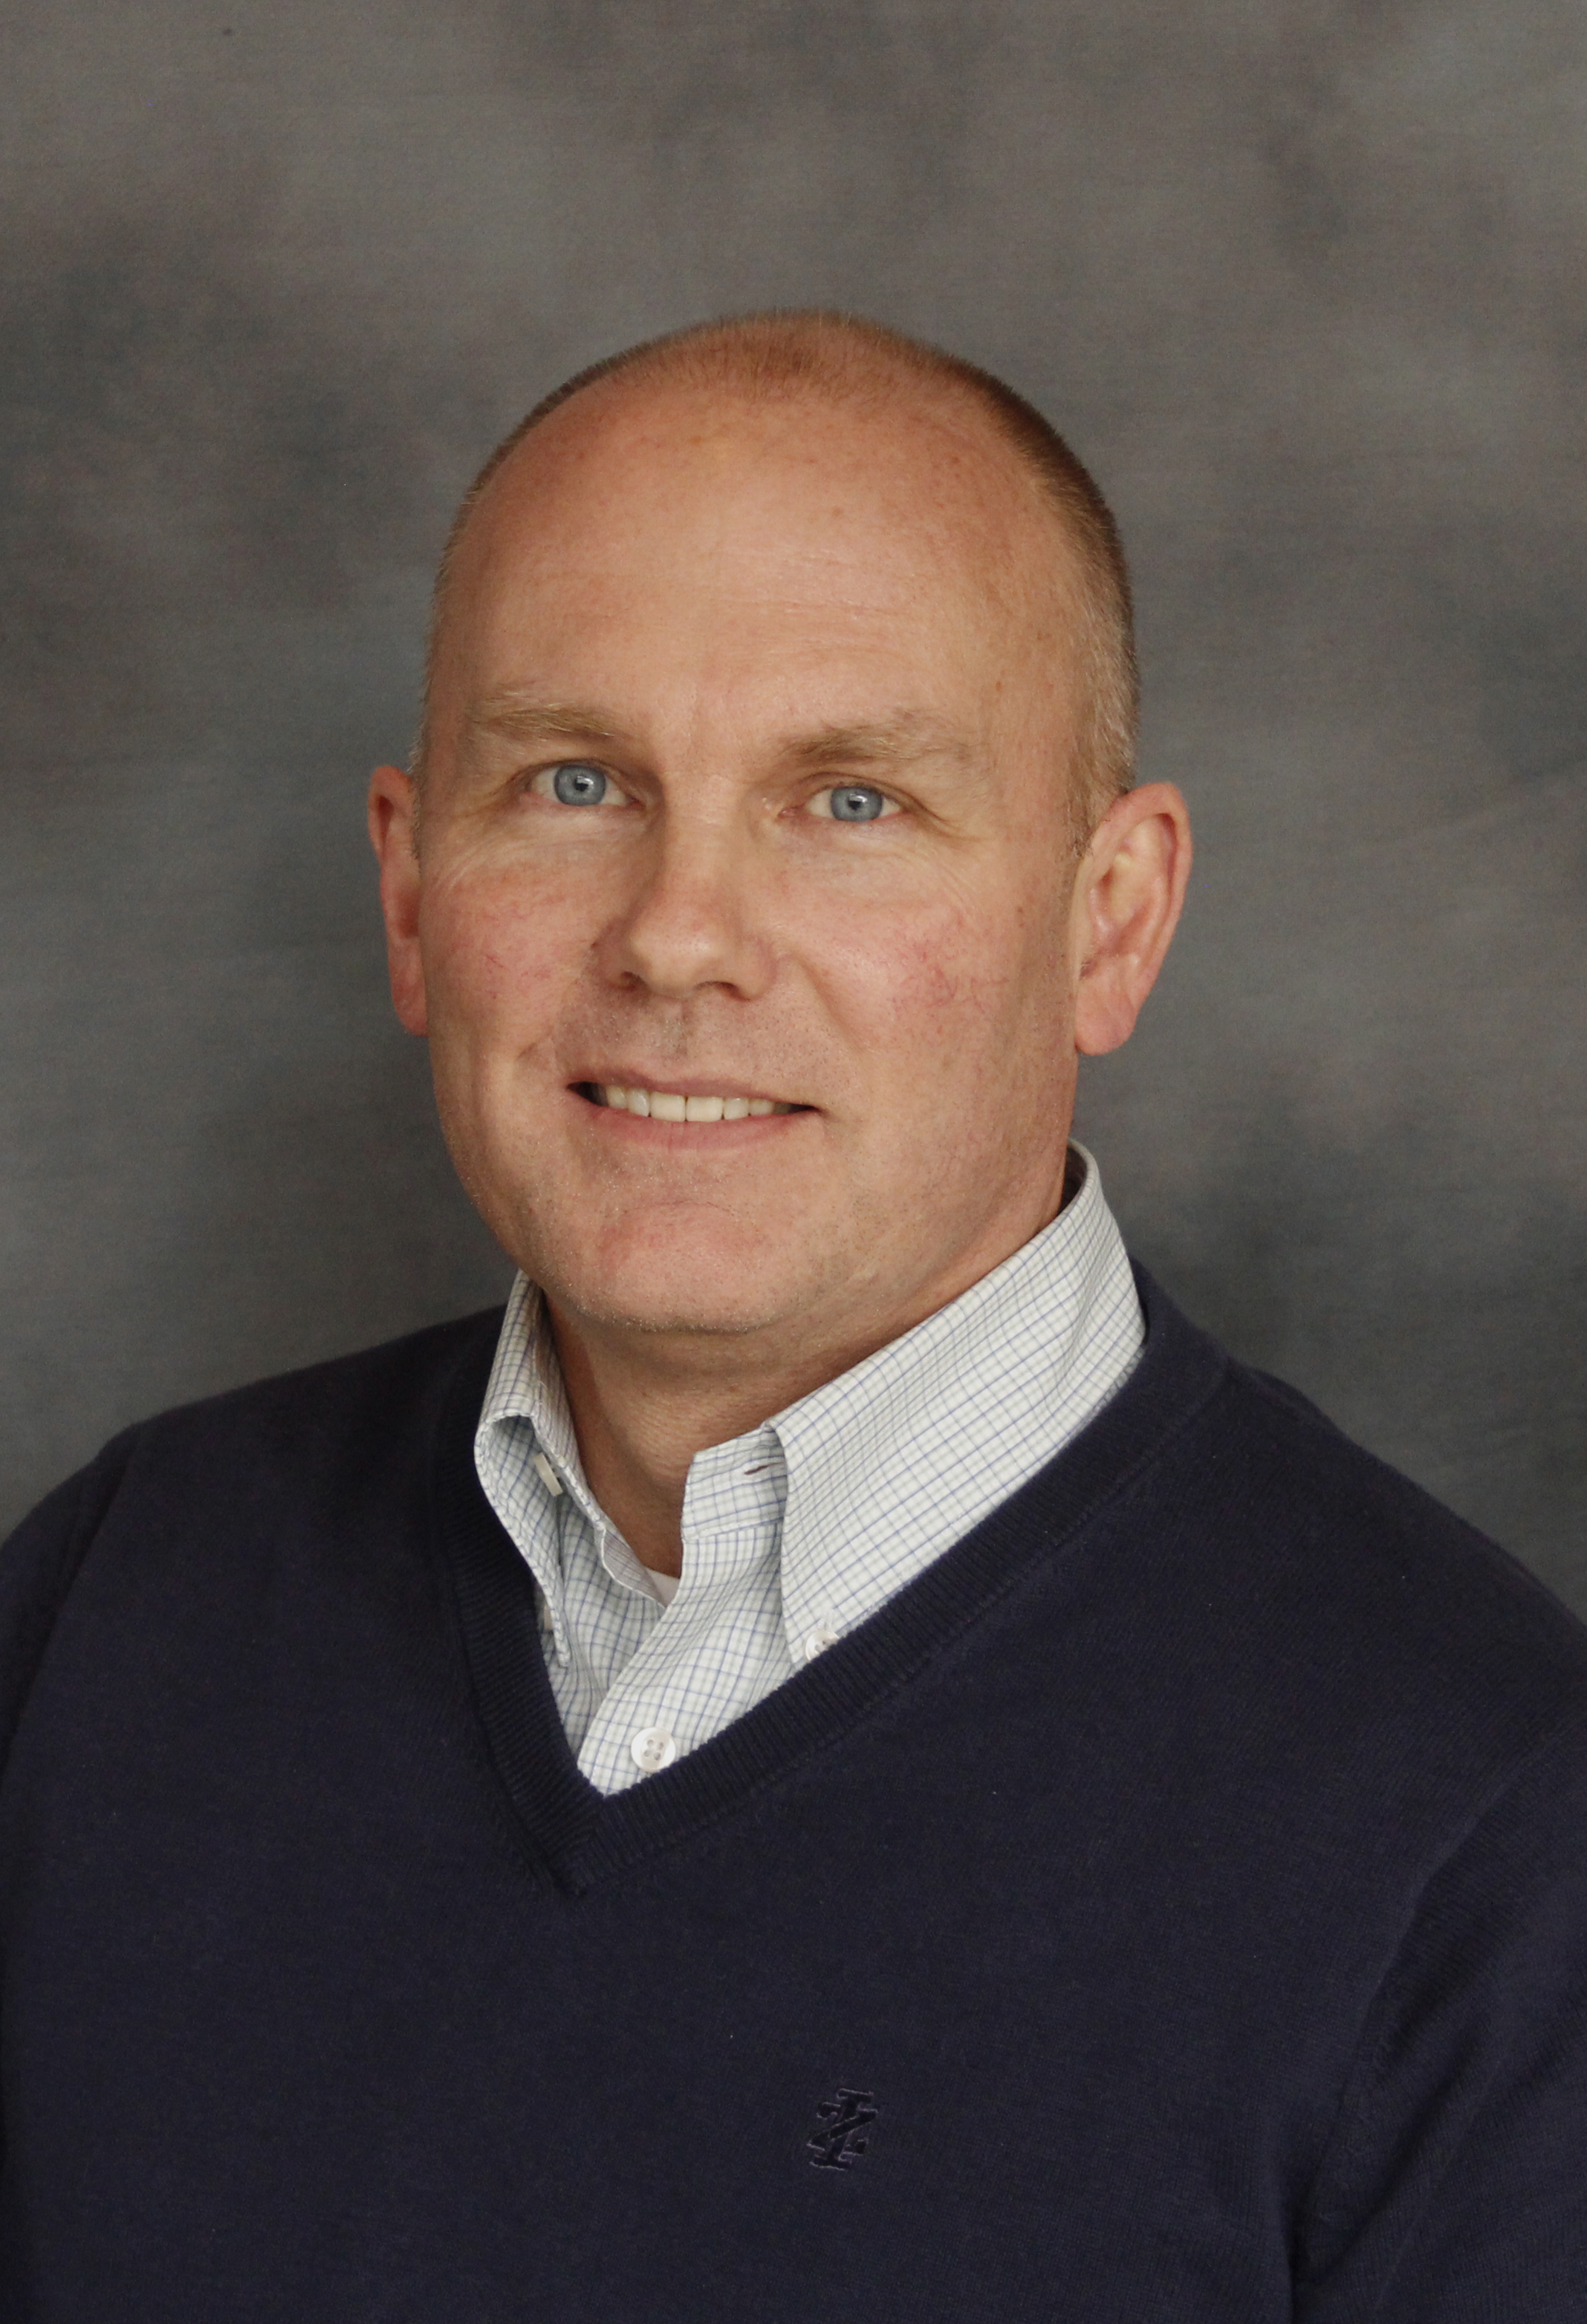 Jim Teal  President & COO, Hitachi Capital America Vendor Services